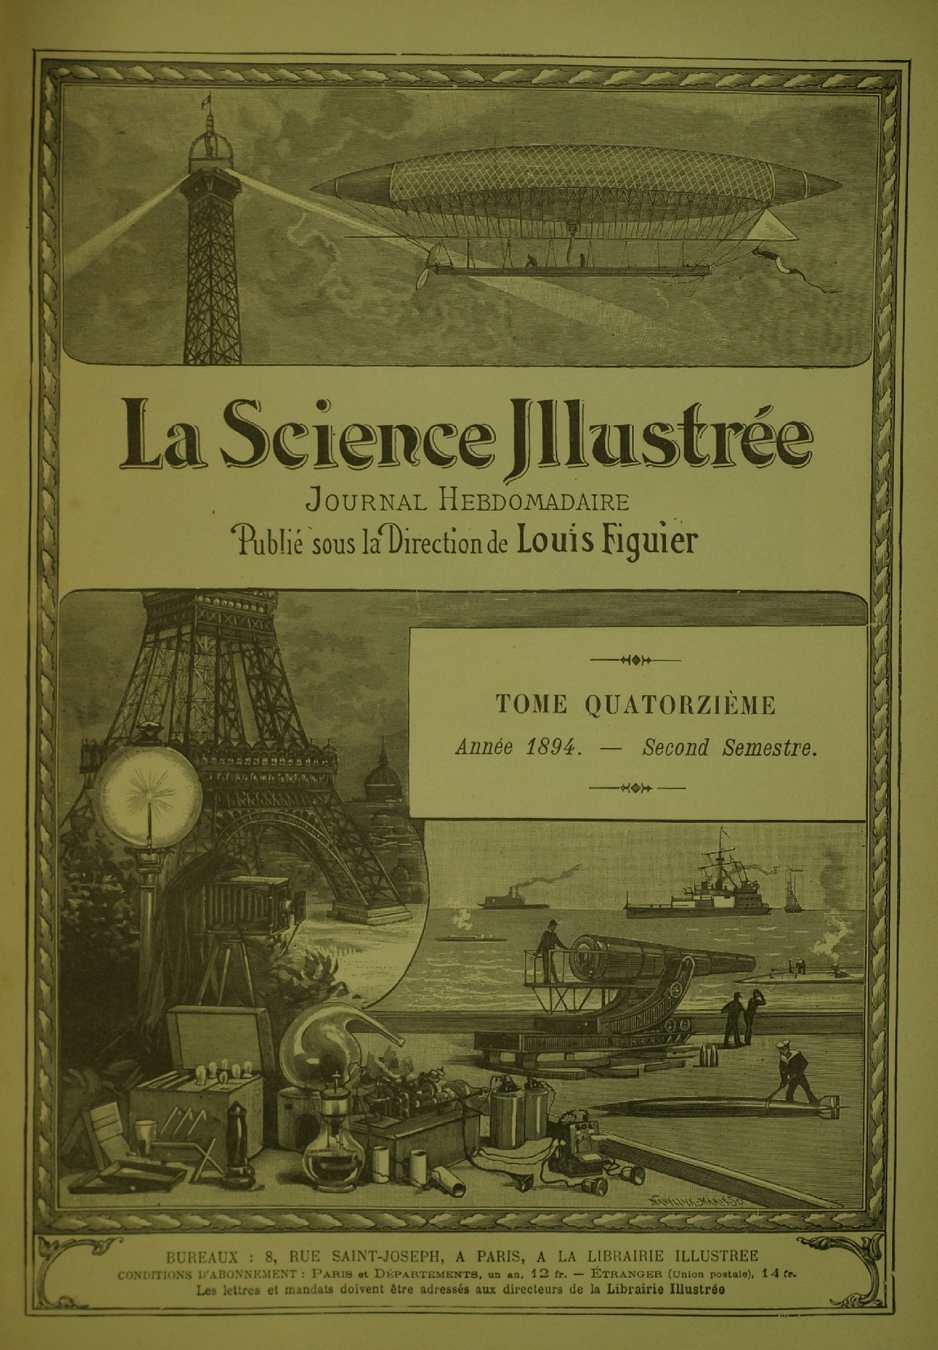 Calaméo - - La Science Illustree 1894 2 c8ff8939fda6